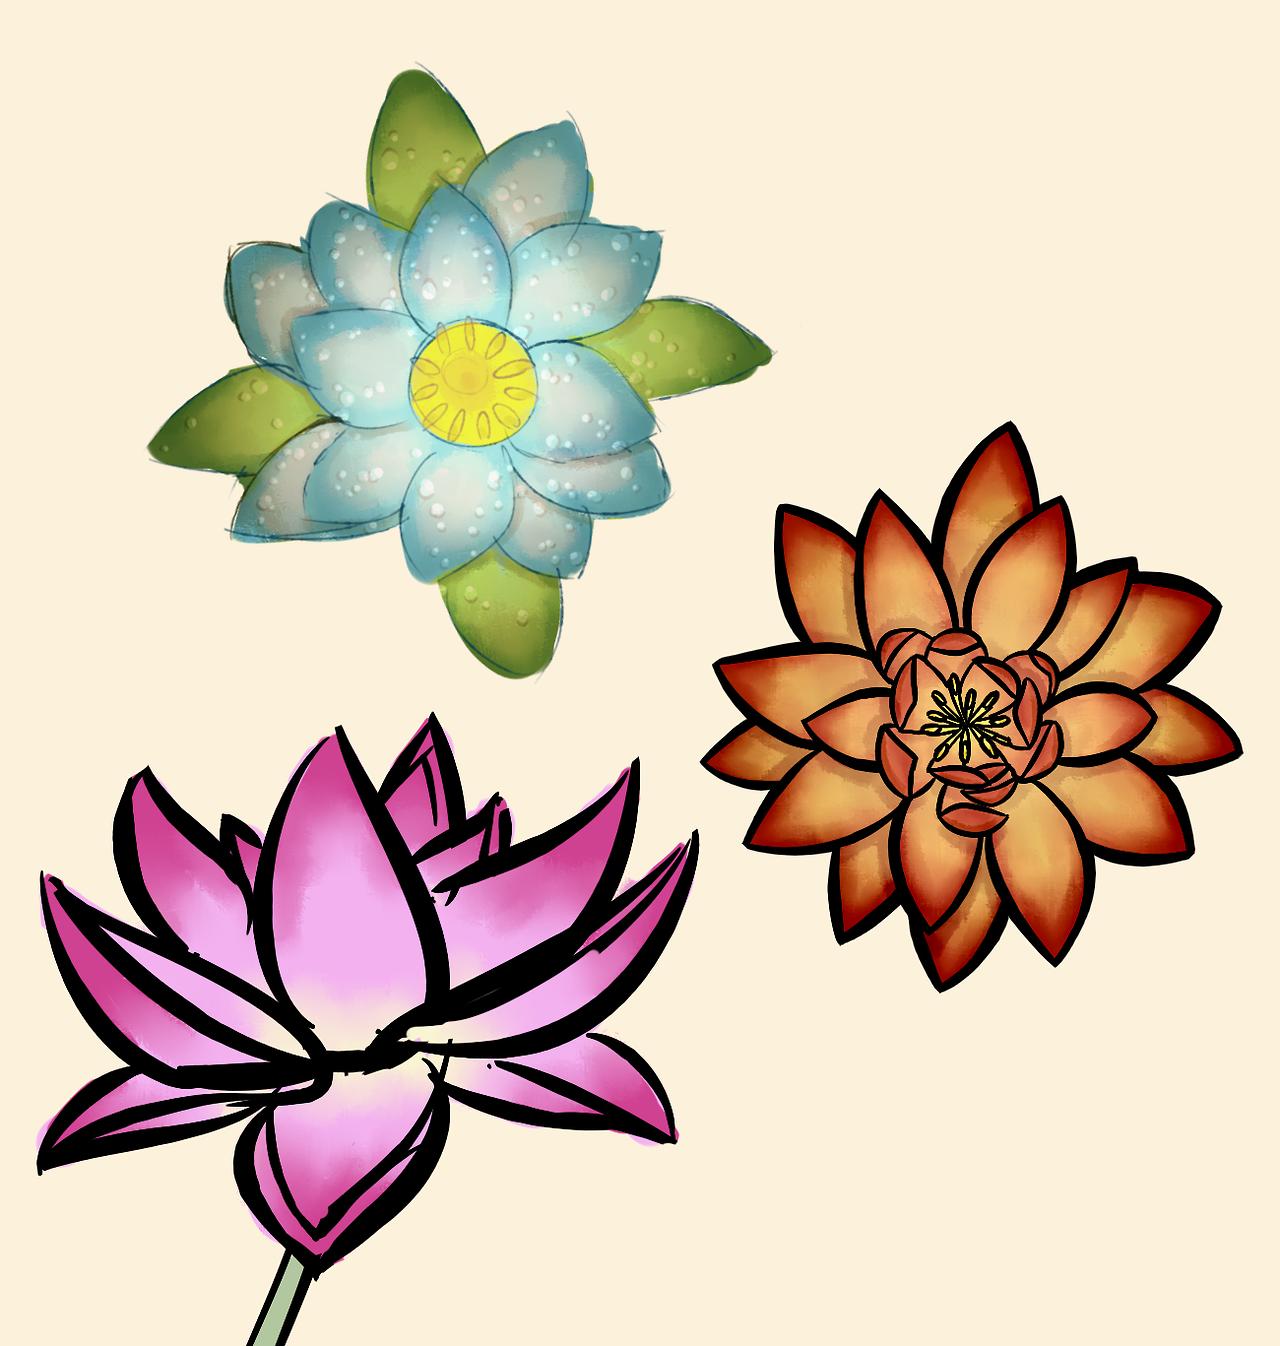 Flower Clipart Tumblr Free Download Best Flower Clipart Tumblr On